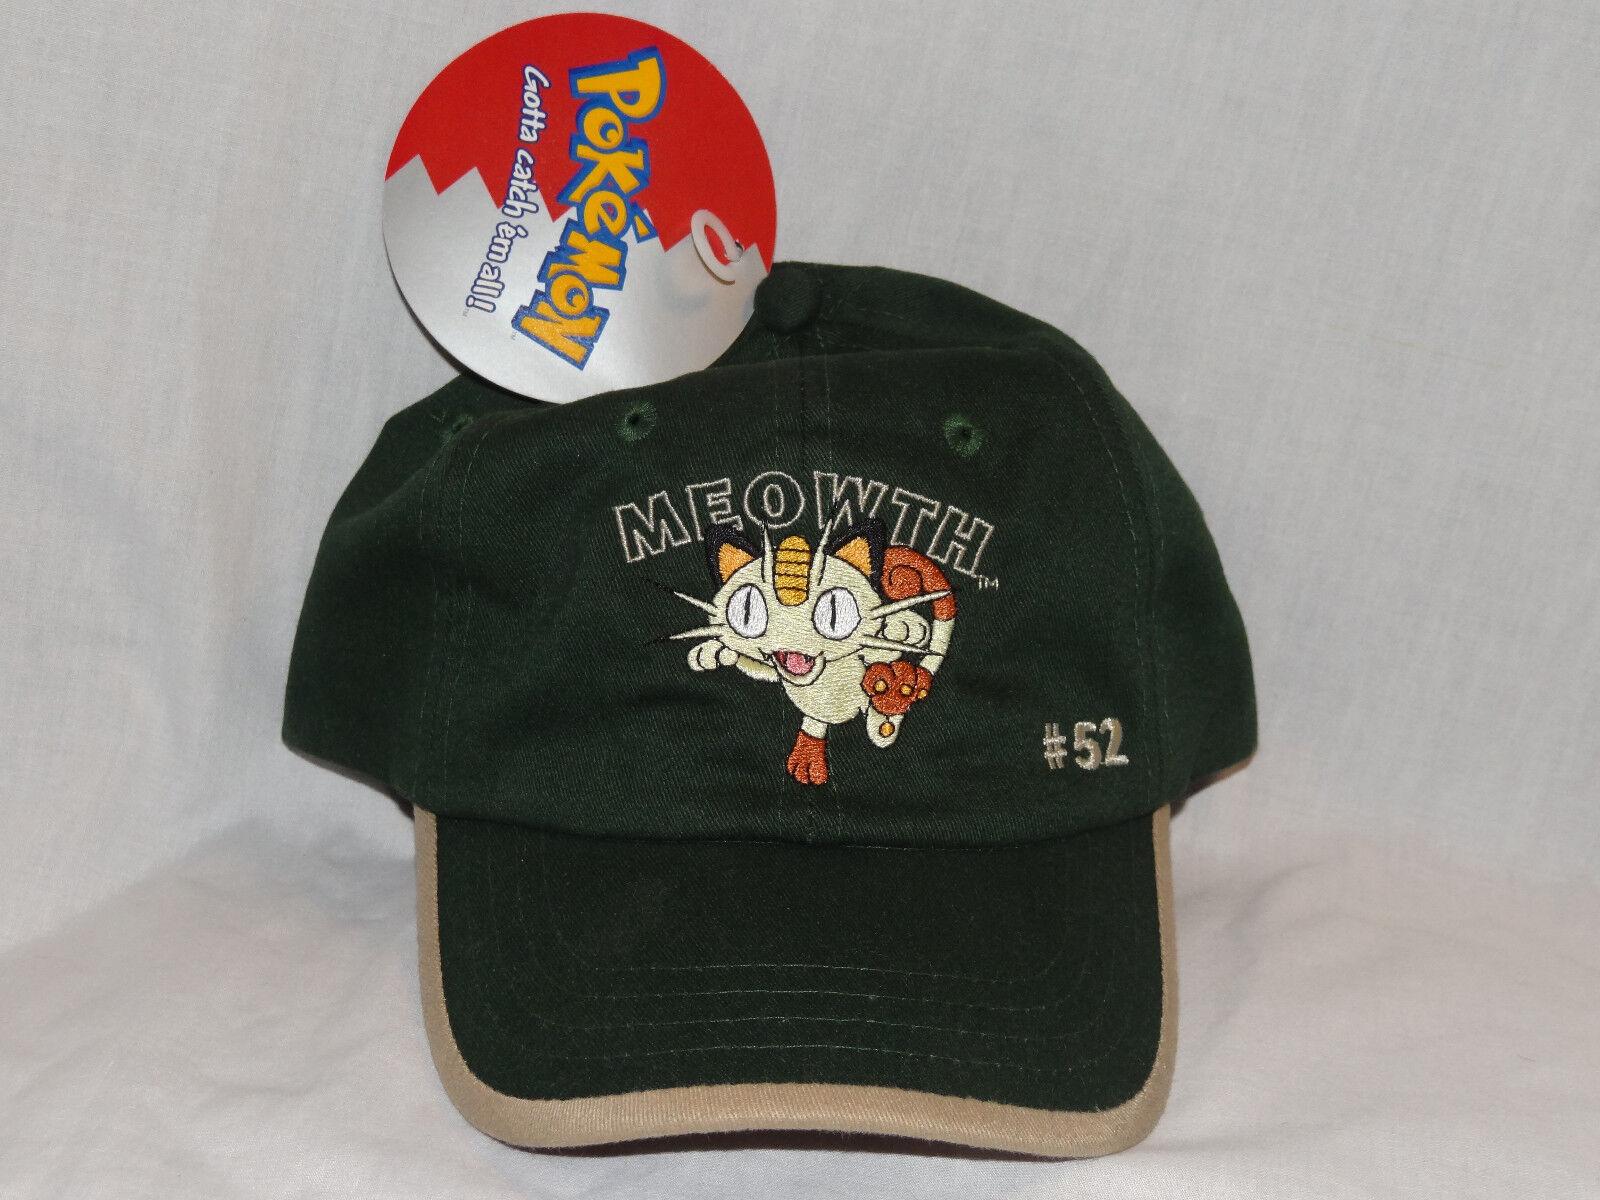 NEW WITH TAGS POKEMON CAP  CAP MEOWTH #52 OFFICIAL CAP POKEMON e5ae3c